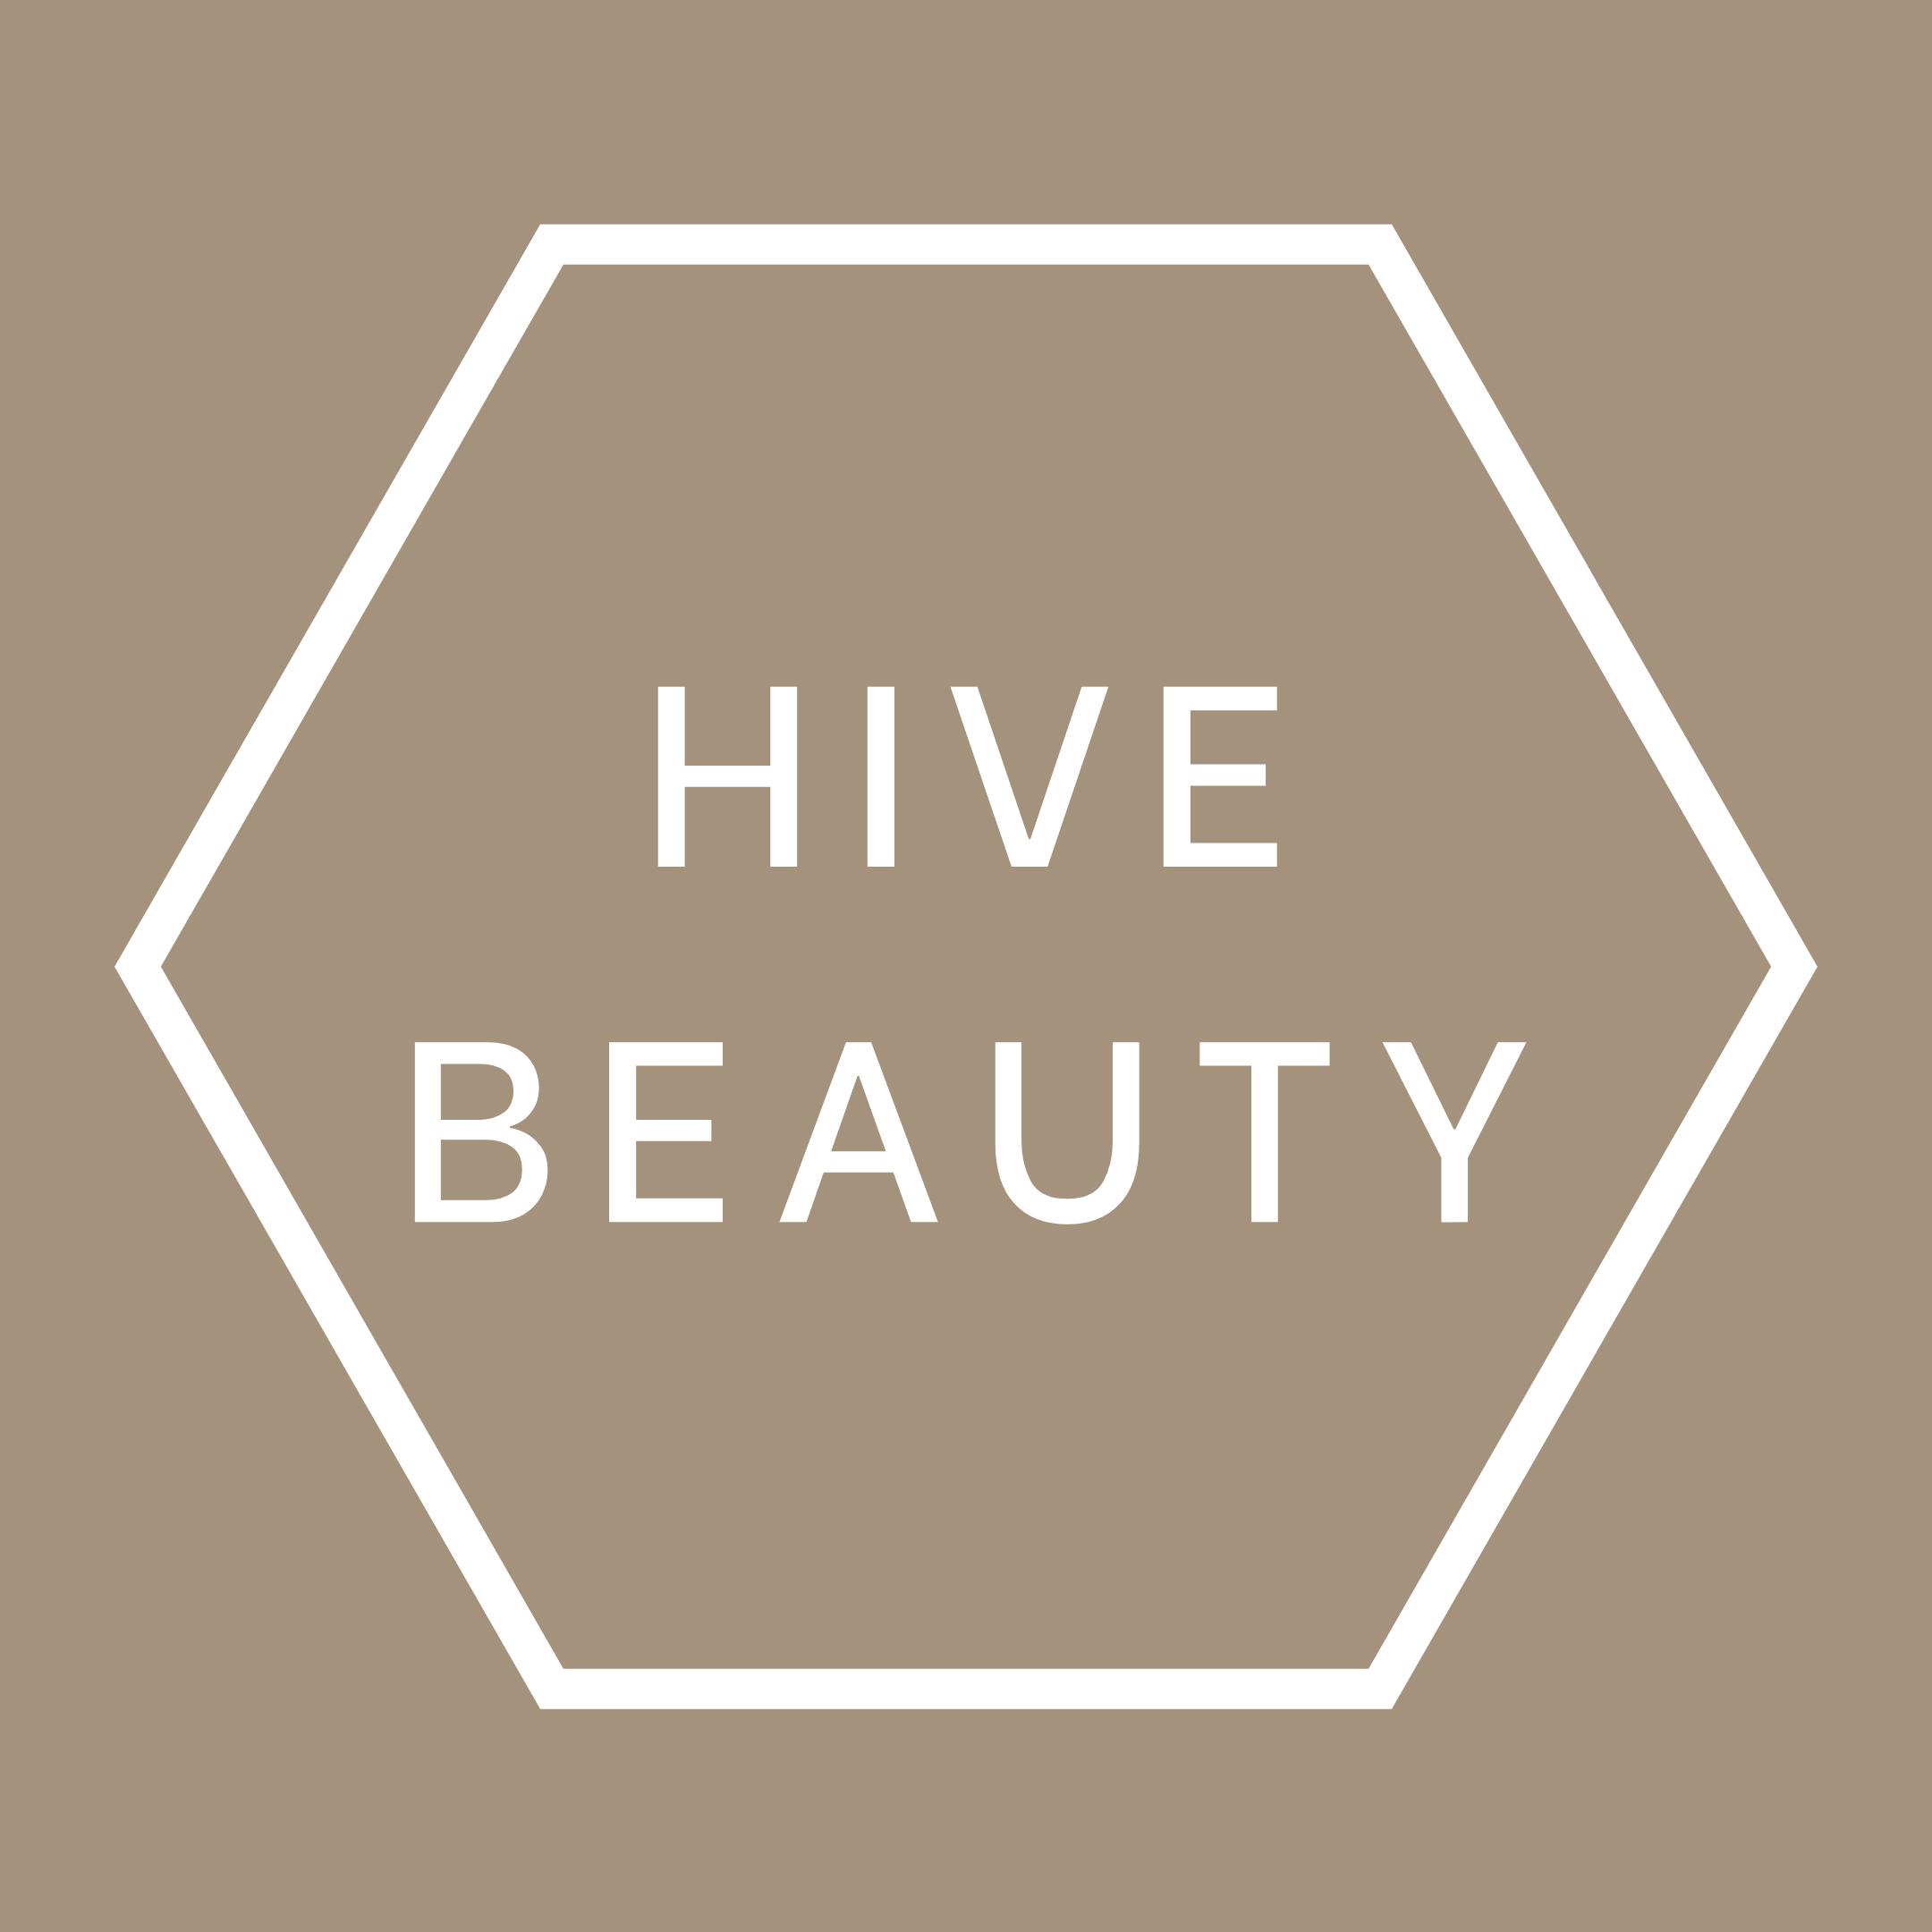 Hive Beauty